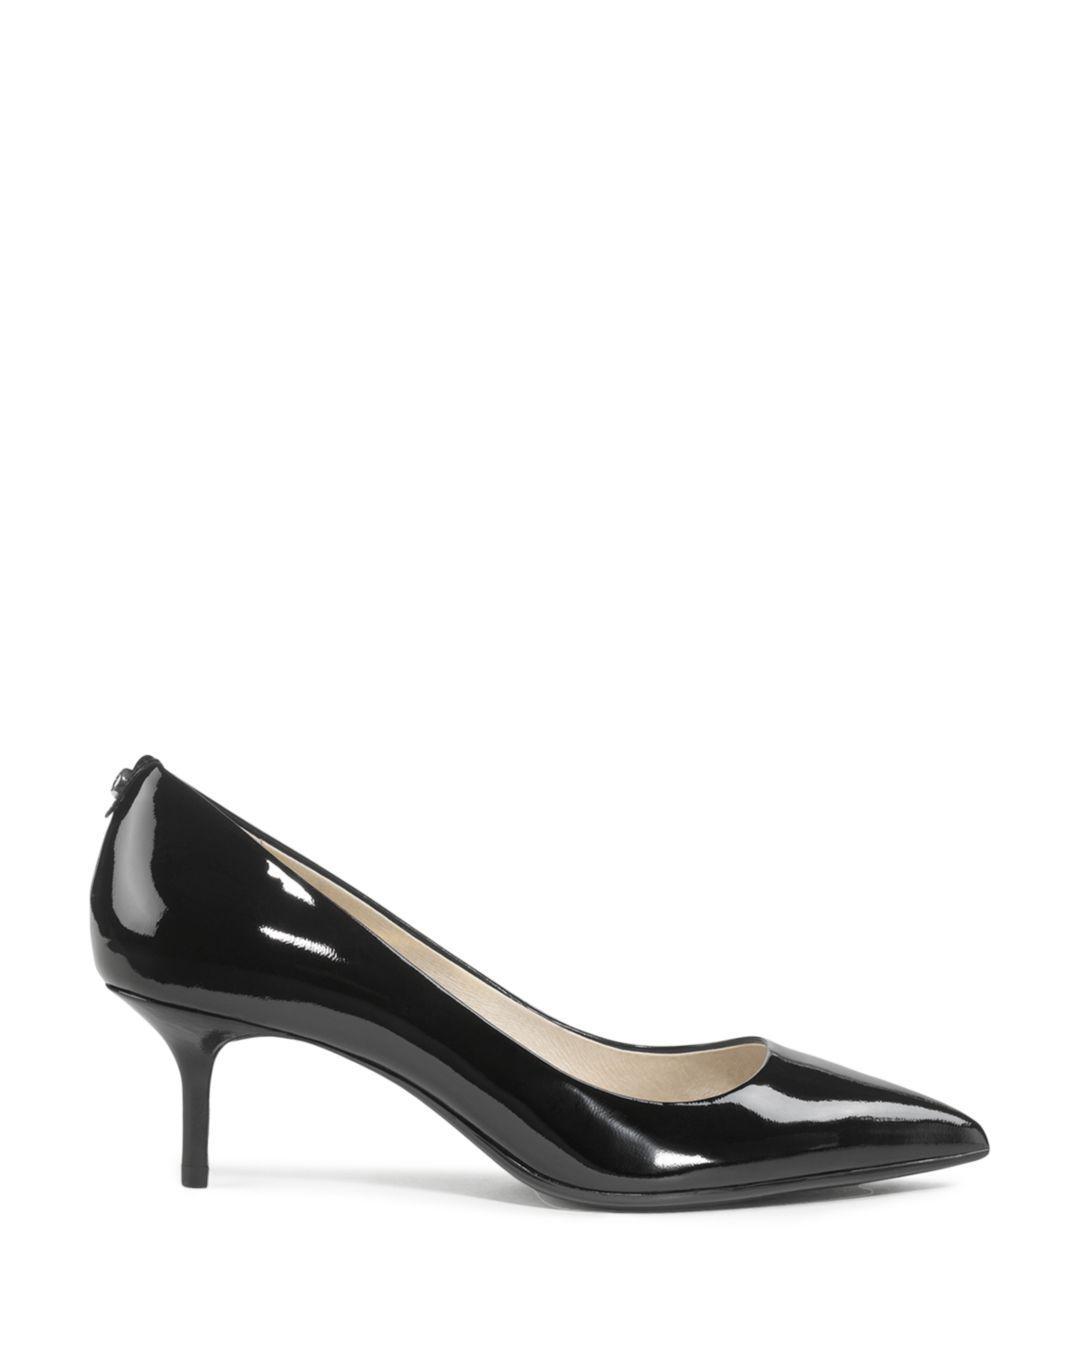 a3b409f04c7 Lyst - Michael Michael Kors Mk Flex Kitten Heel Pumps in Black